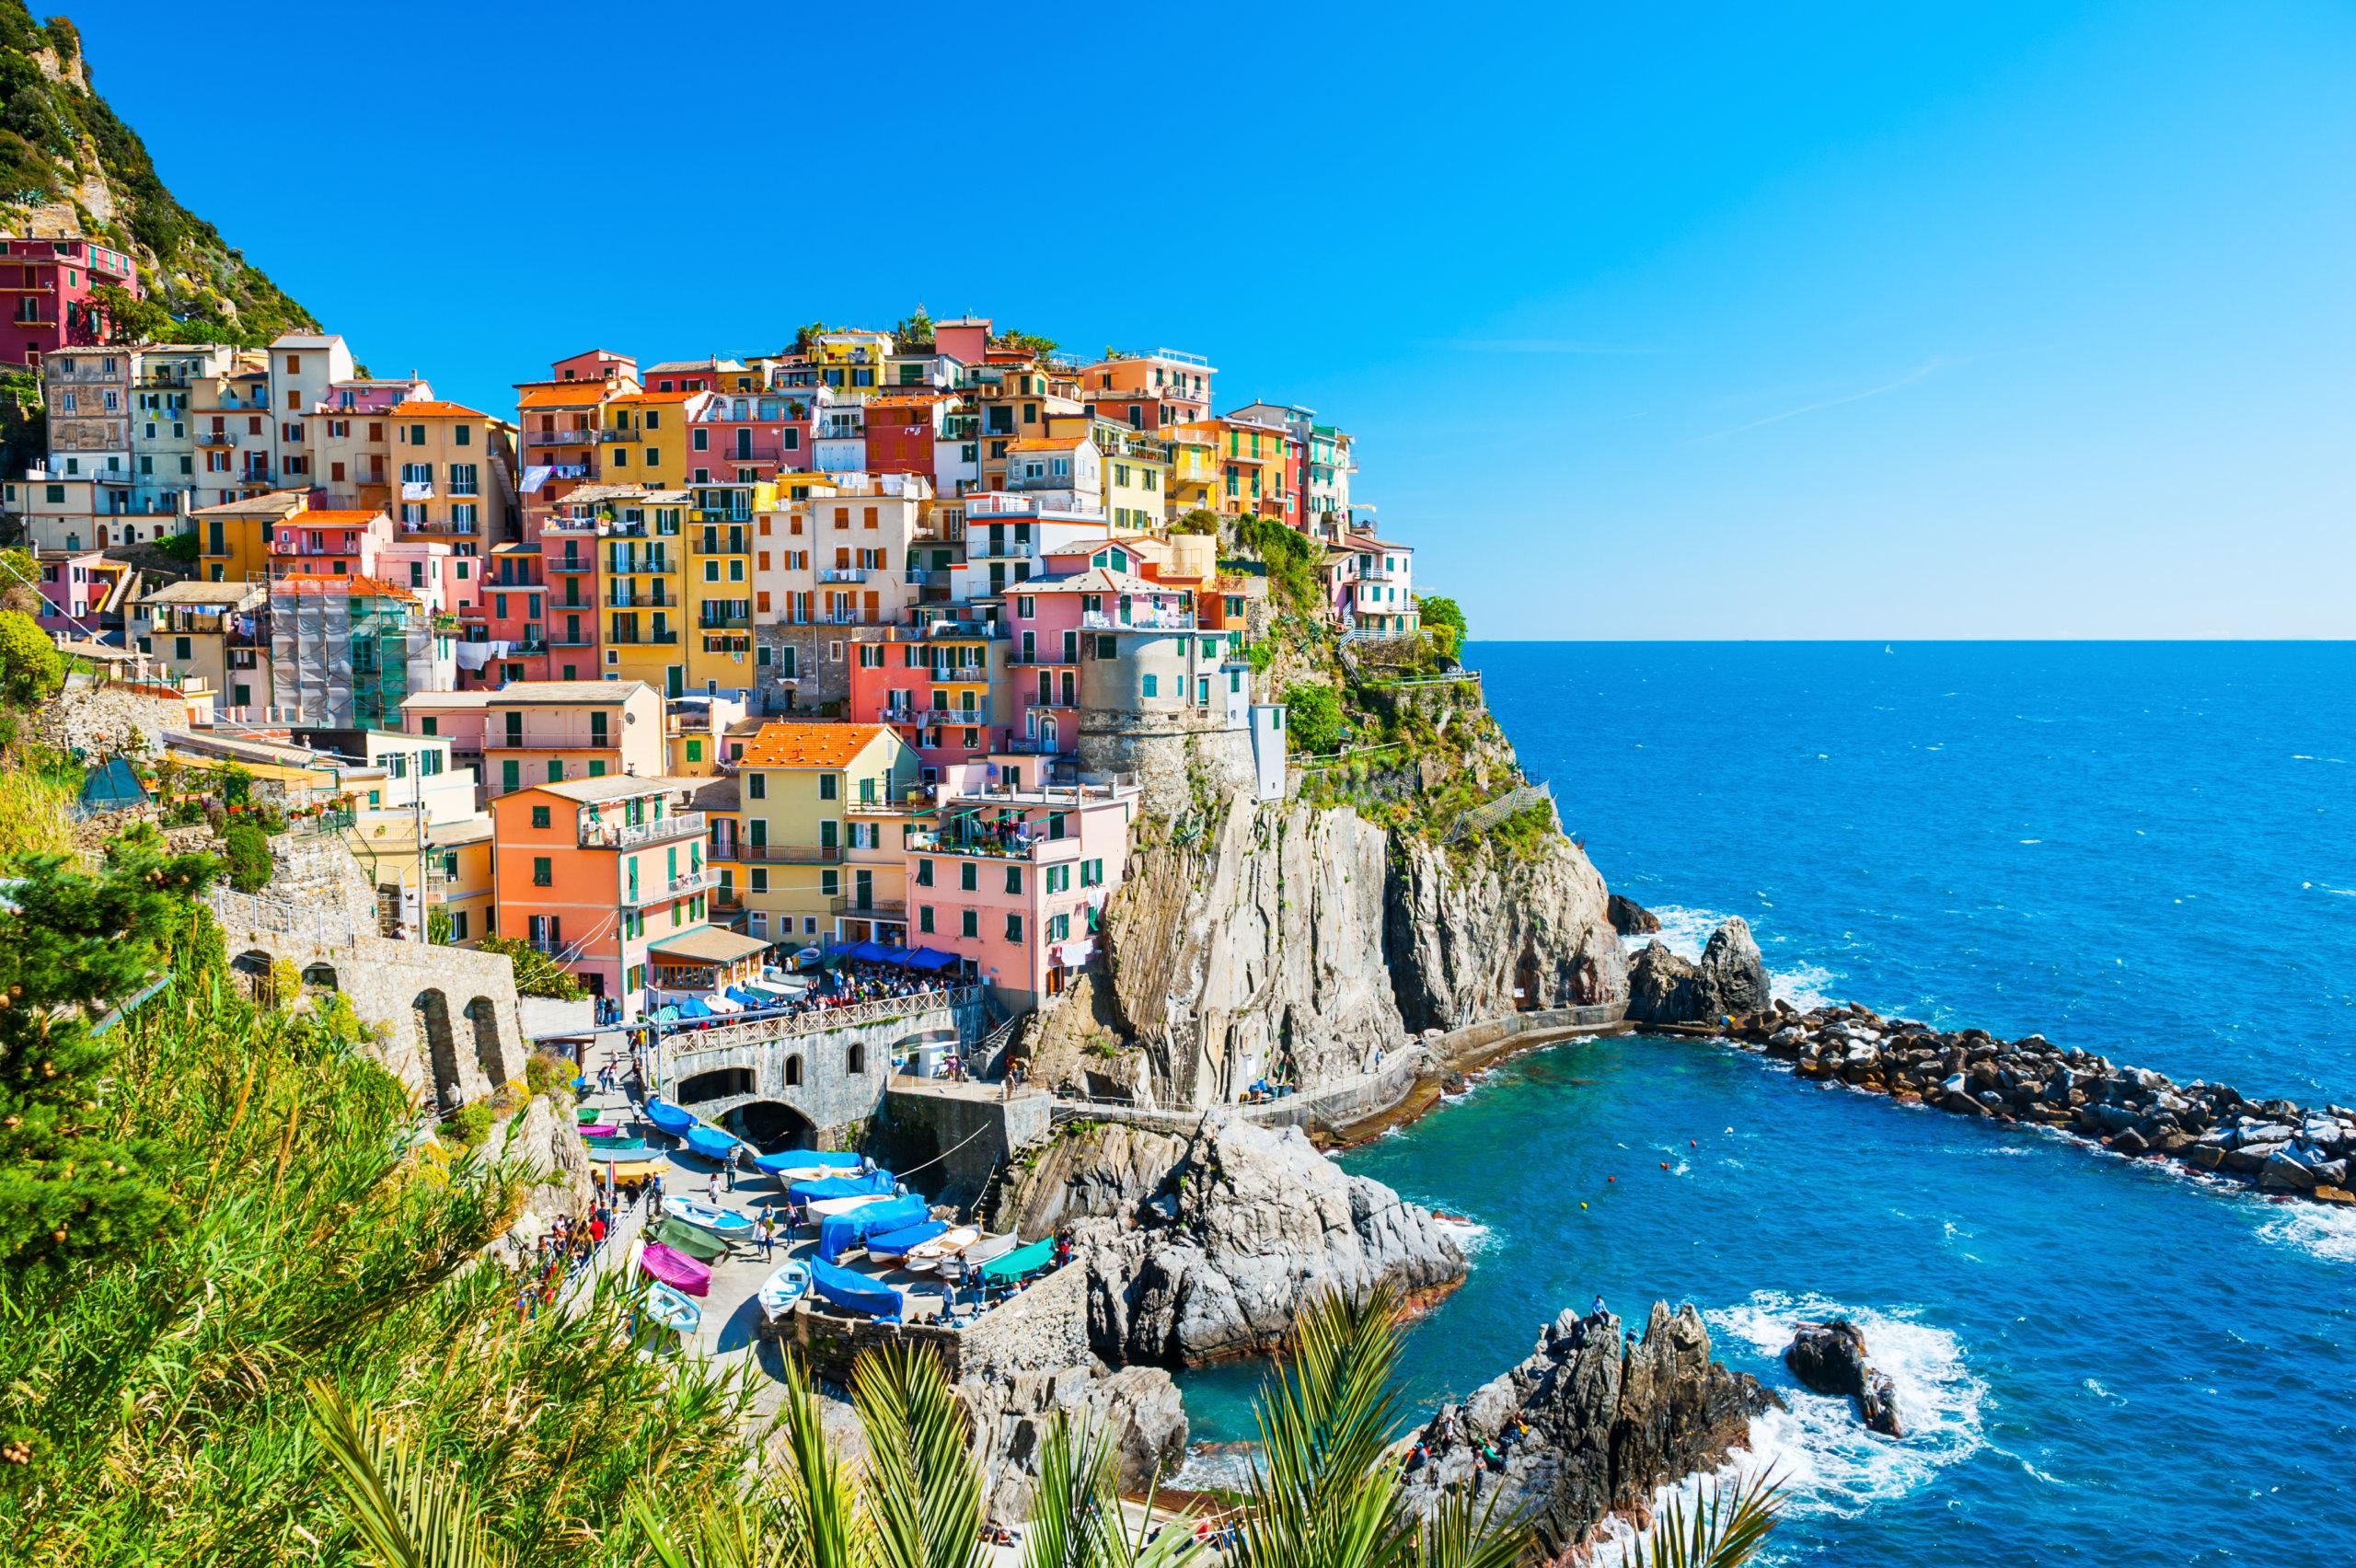 Beautiful view of Manarola town, Cinque National Park, Liguria, Italy